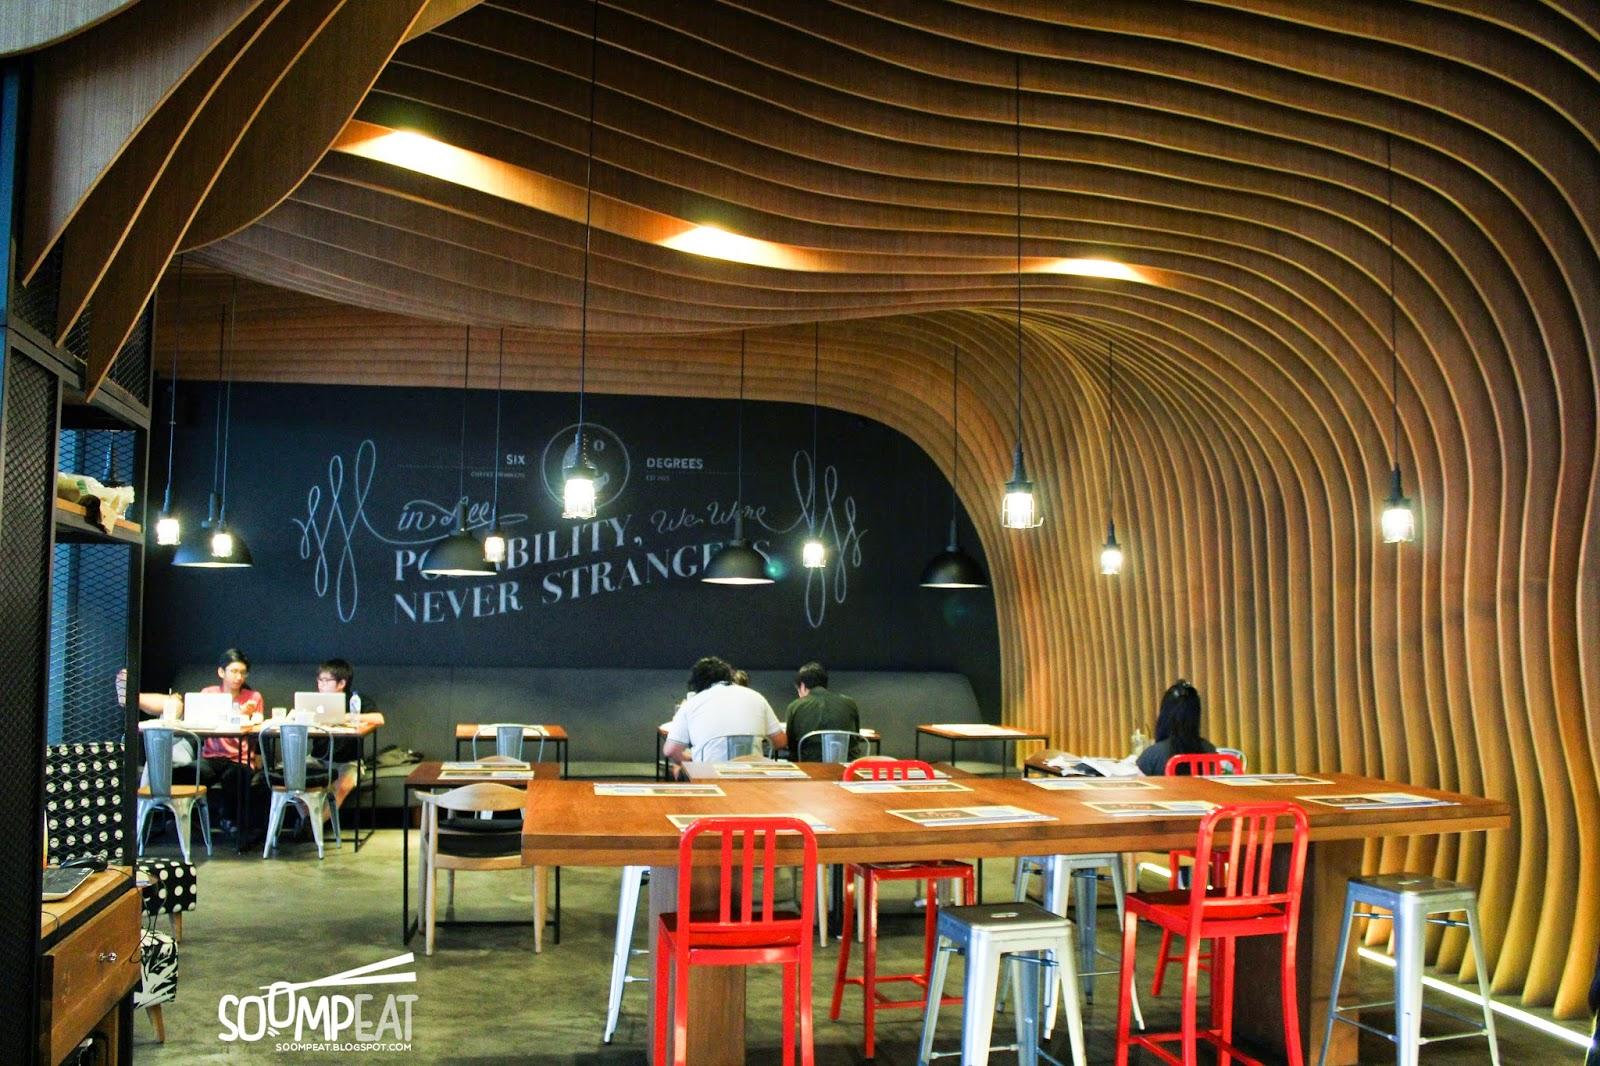 6 degrees coffee drinkers mall alam sutera tangerang soompeat indoor dining area altavistaventures Image collections